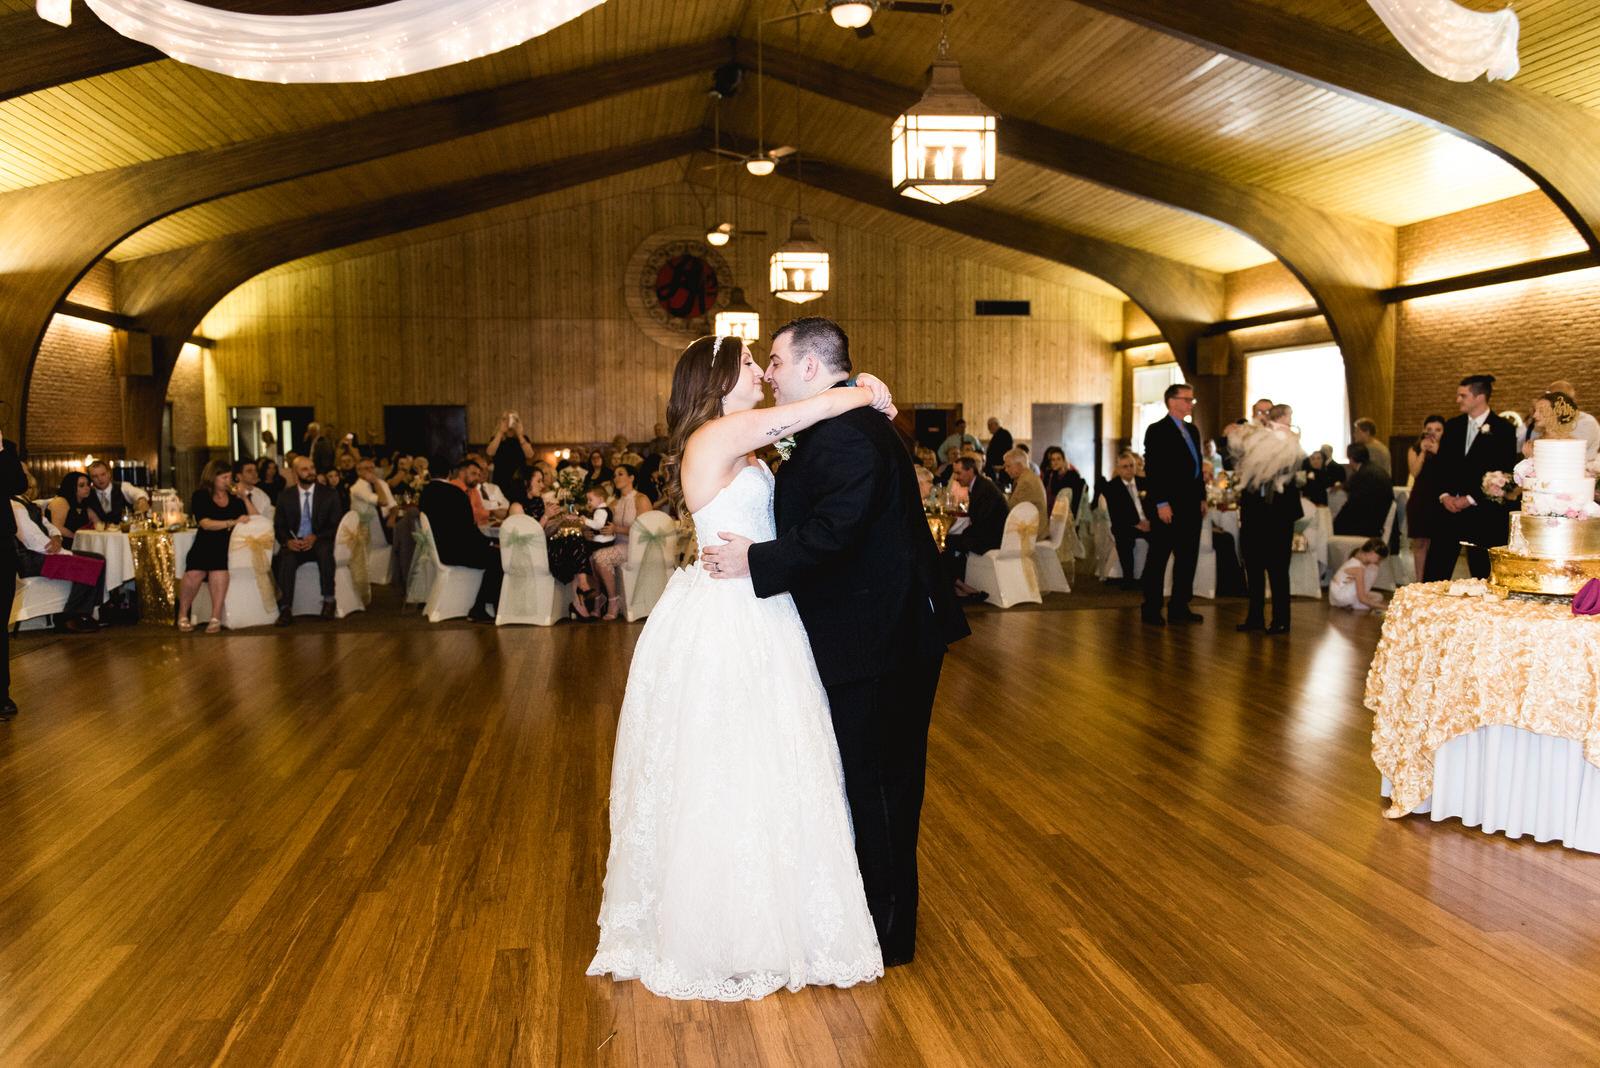 Laube_Banquet_Hall__Wedding_Photos_072.jpg